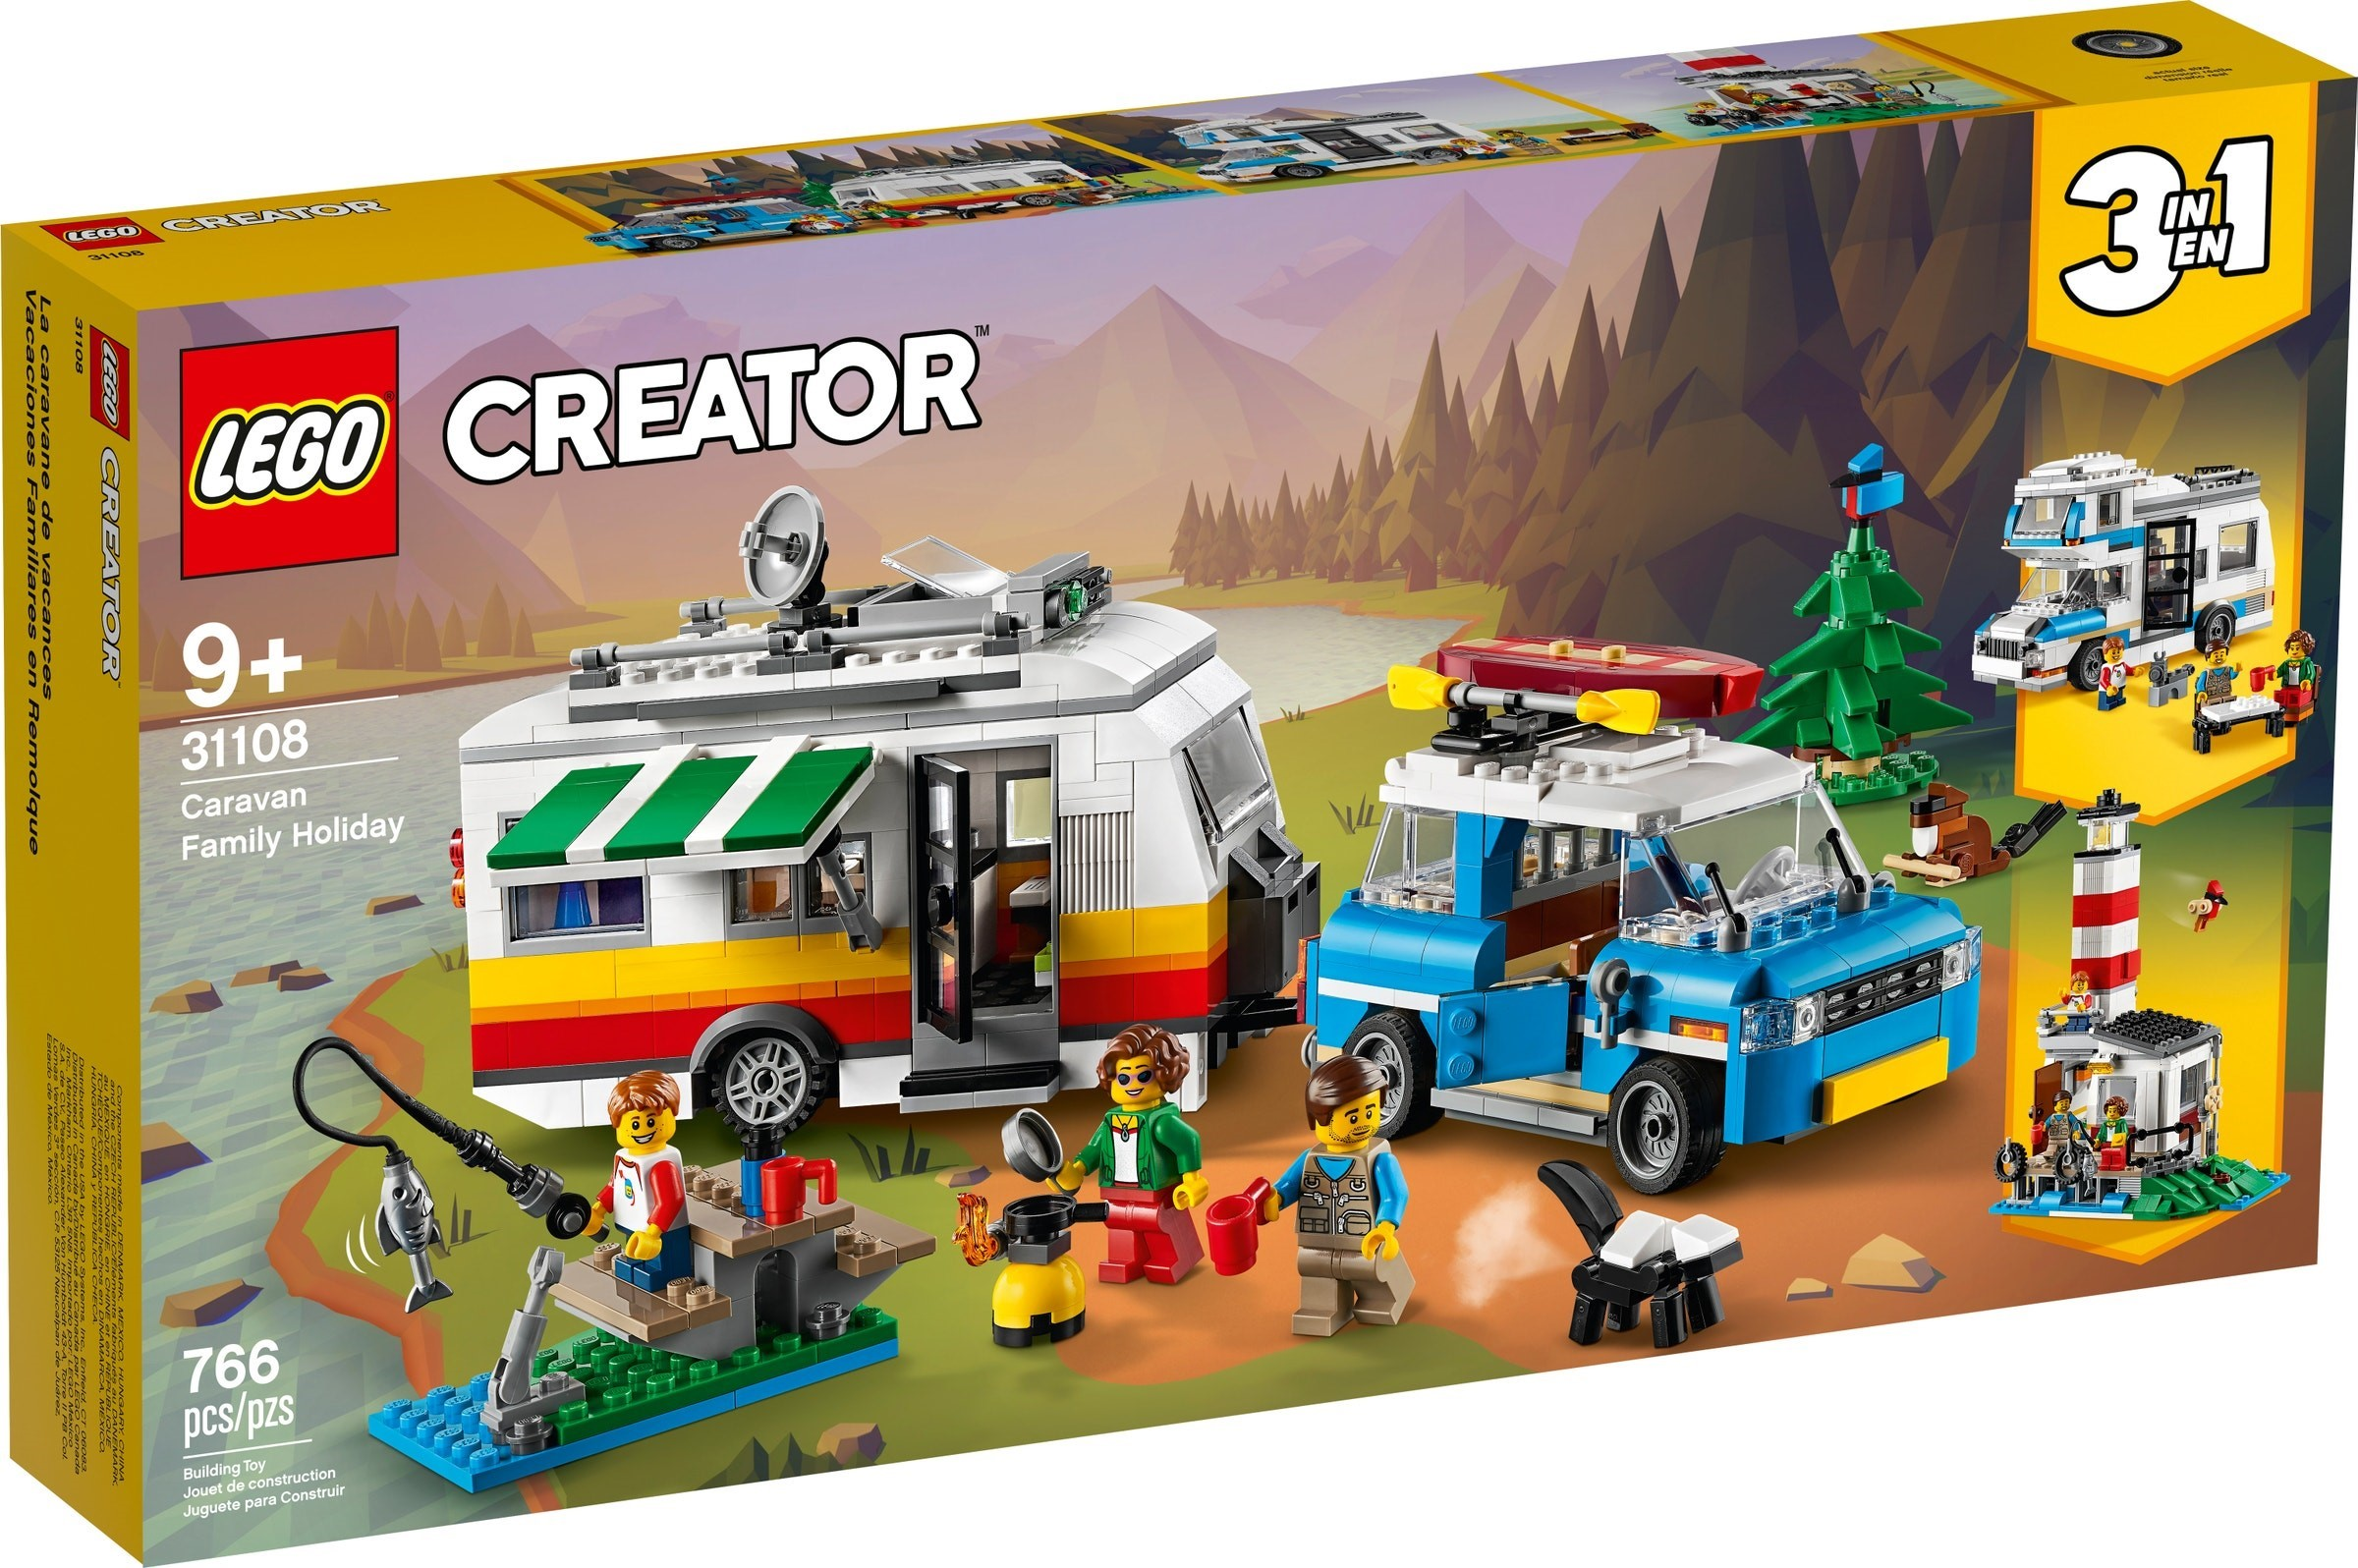 LEGO Creator - Caravan Family Holiday (31108)